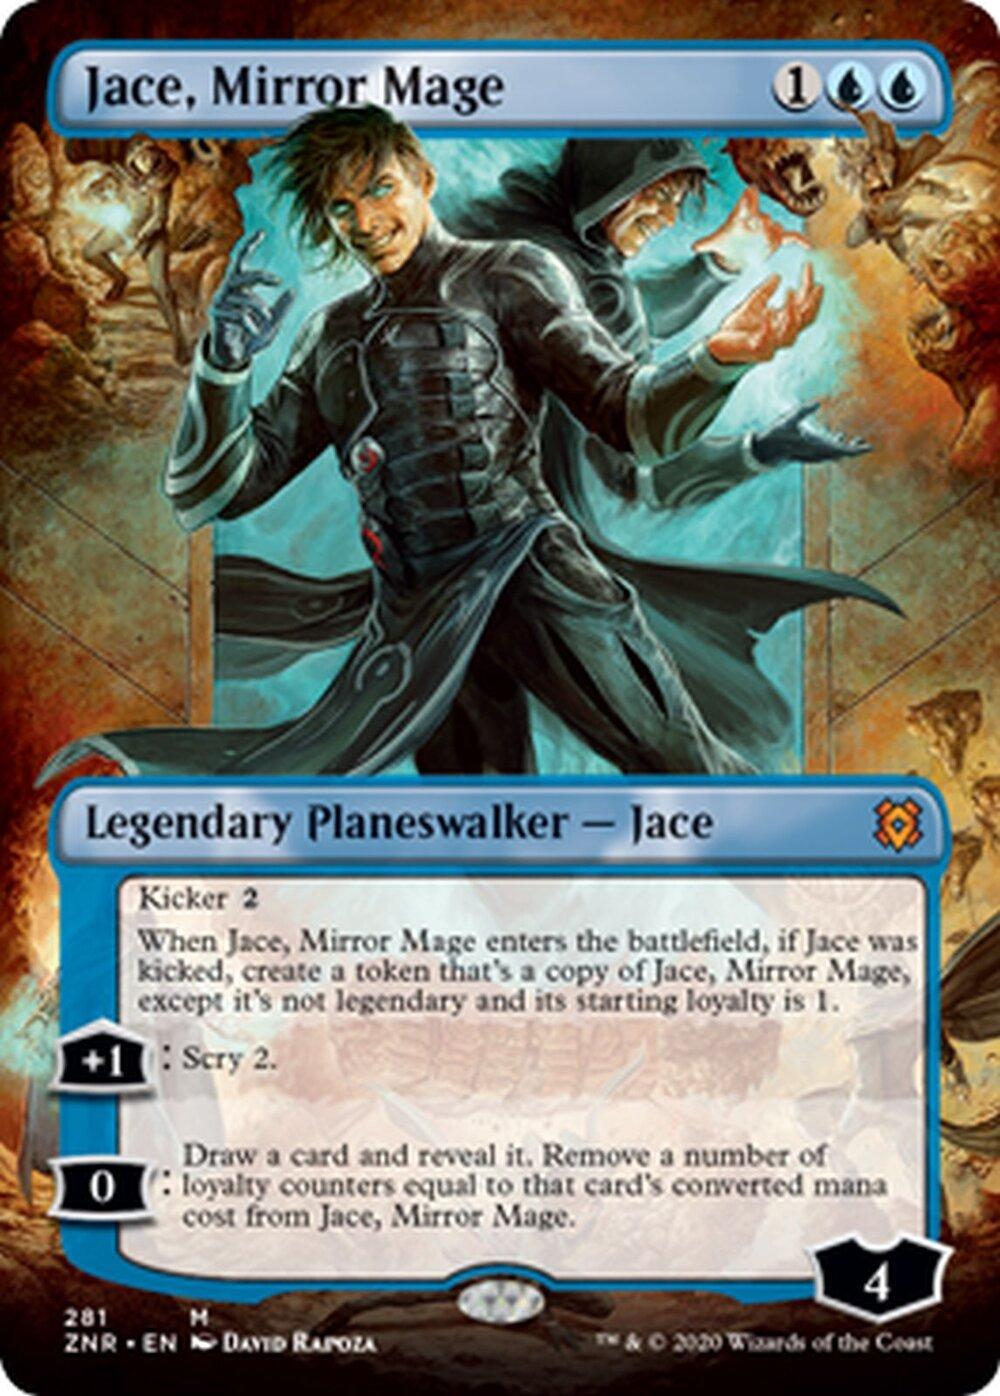 Jace, Mirror Mage (Borderless).jpg